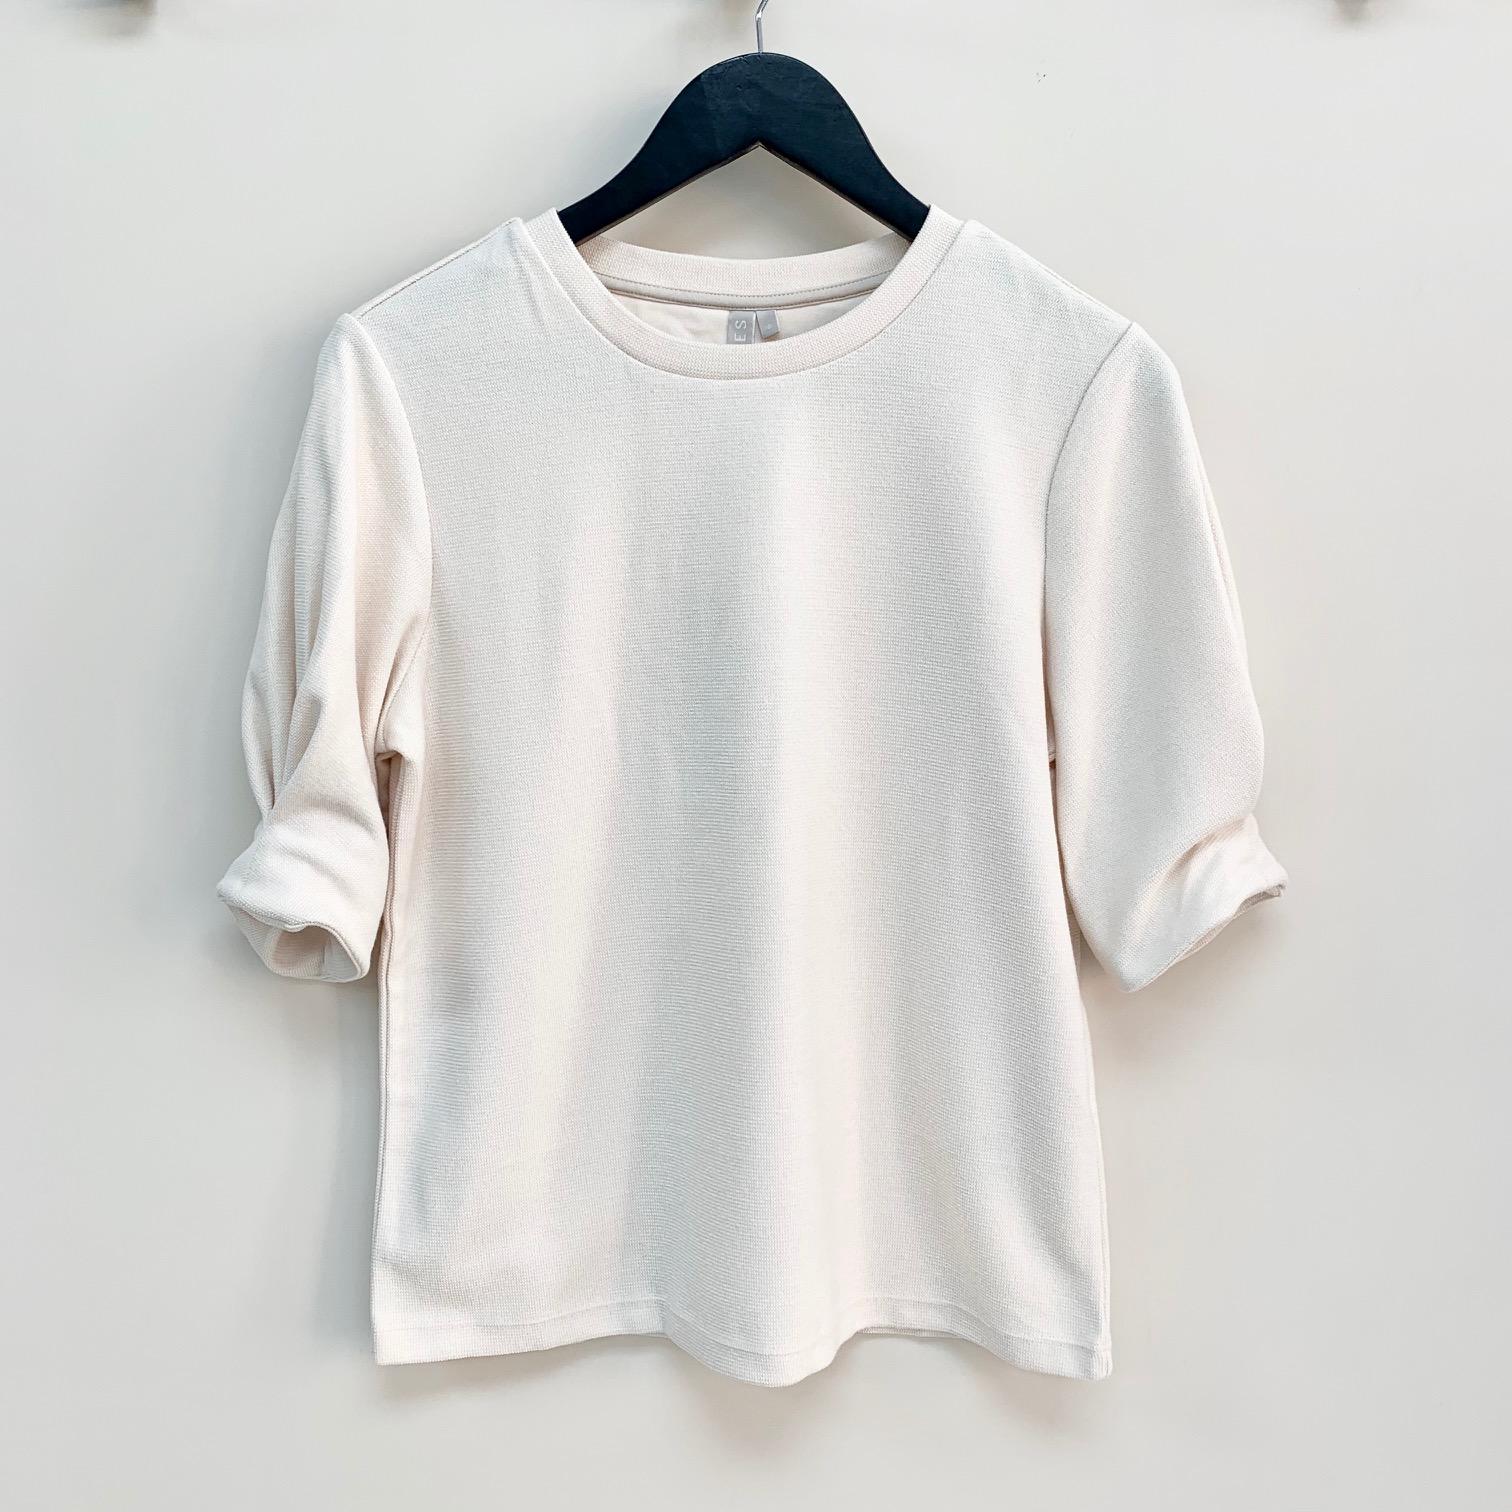 Maeryn Cream 3/4 Sleeve Top